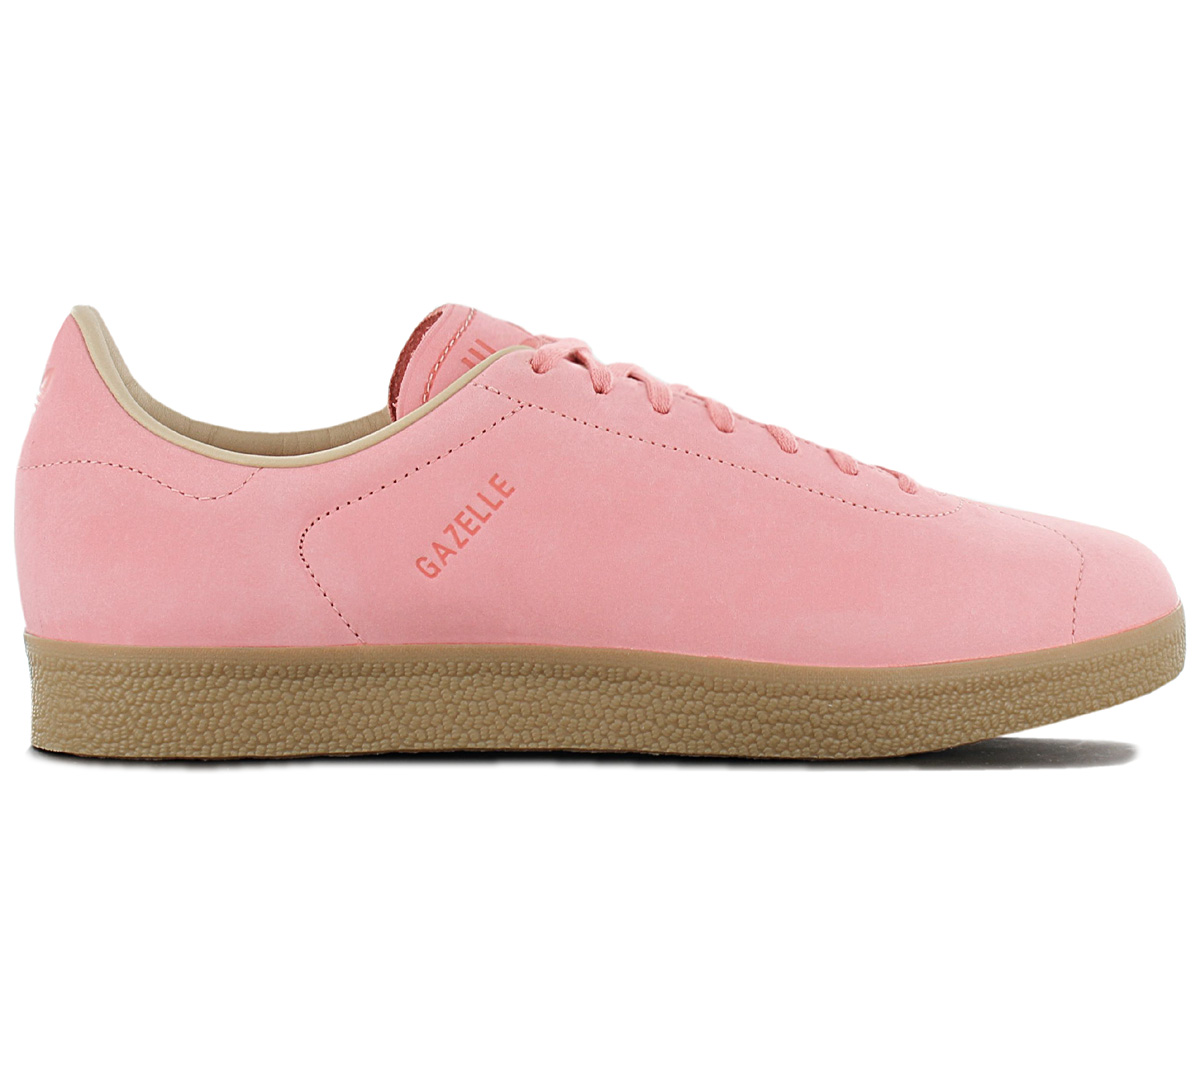 Details about Adidas Originals Gazelle Decon Women's Sneaker CG3706 Pink Shoes Sneakers New